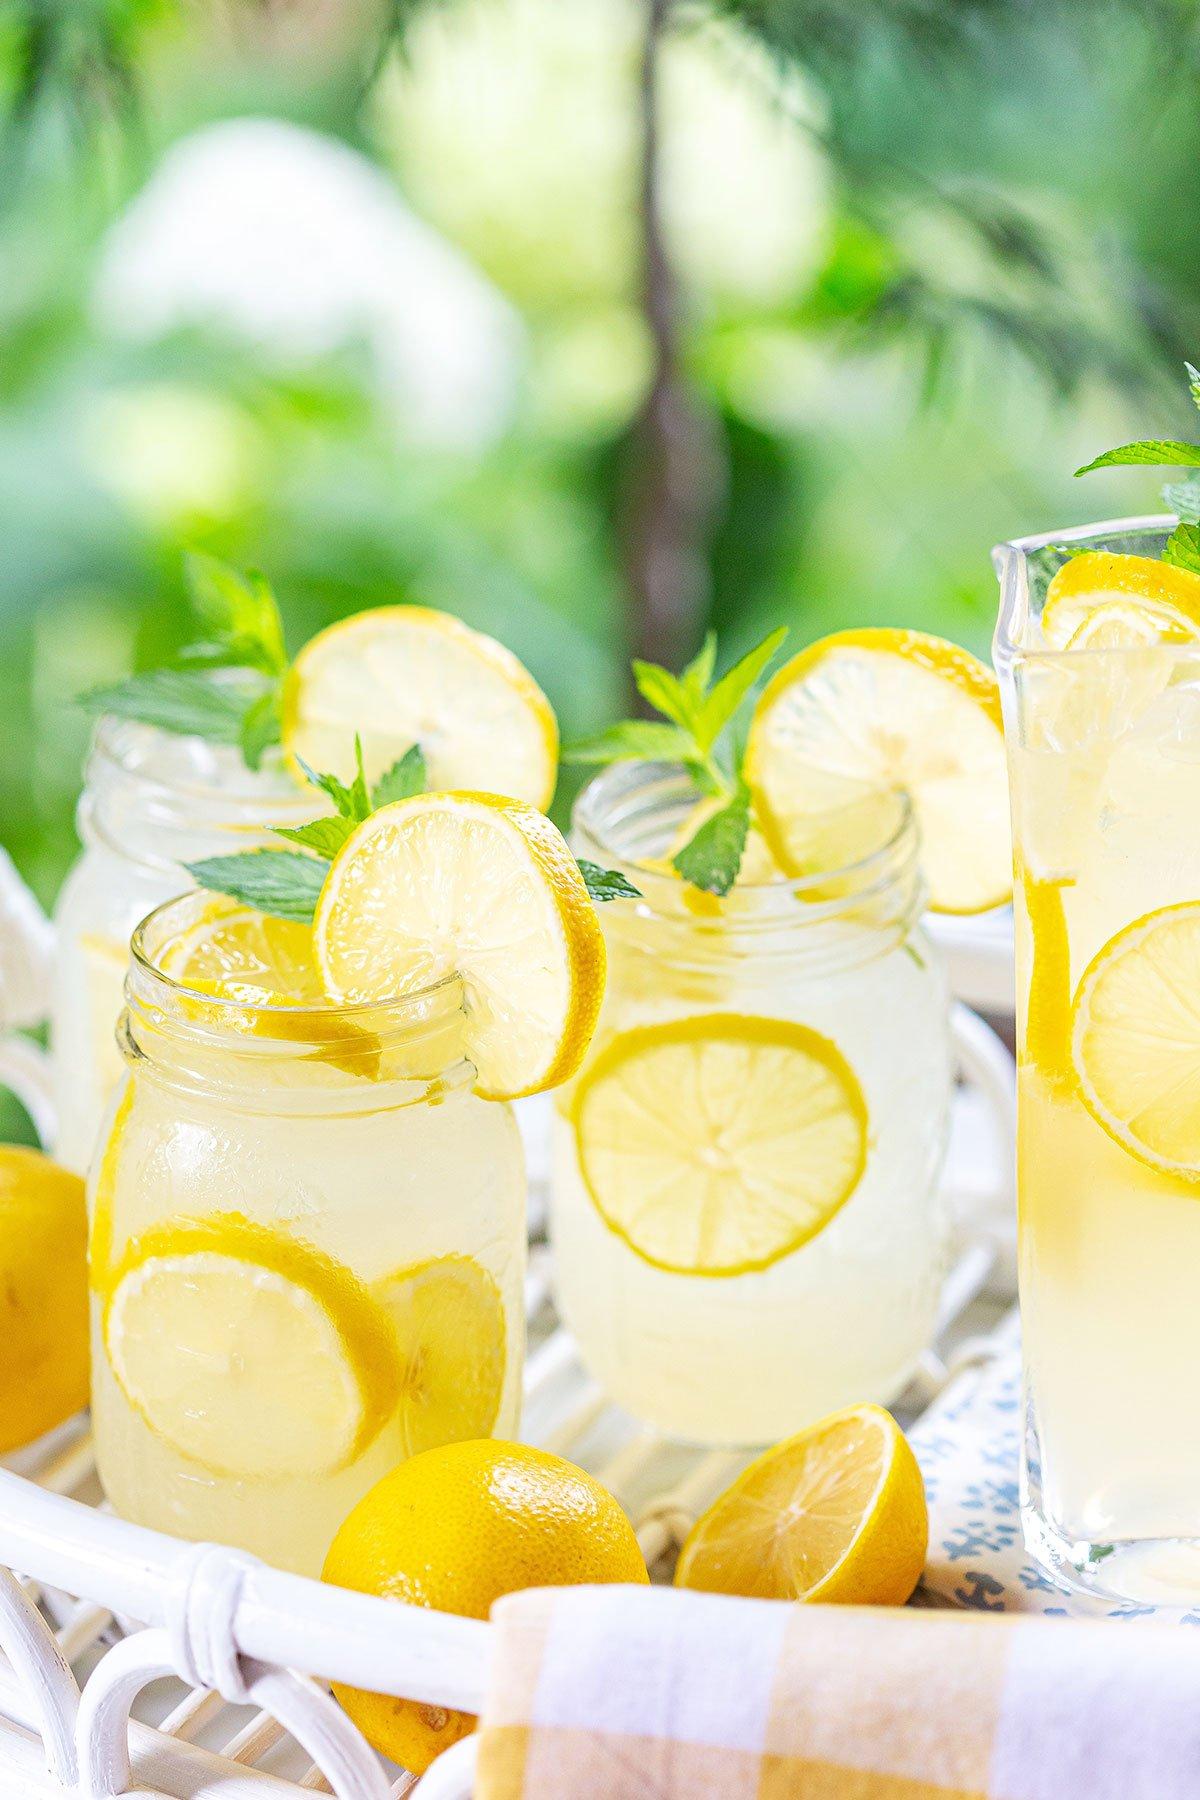 Old-Fashioned Lemonade (3 Ingredients)